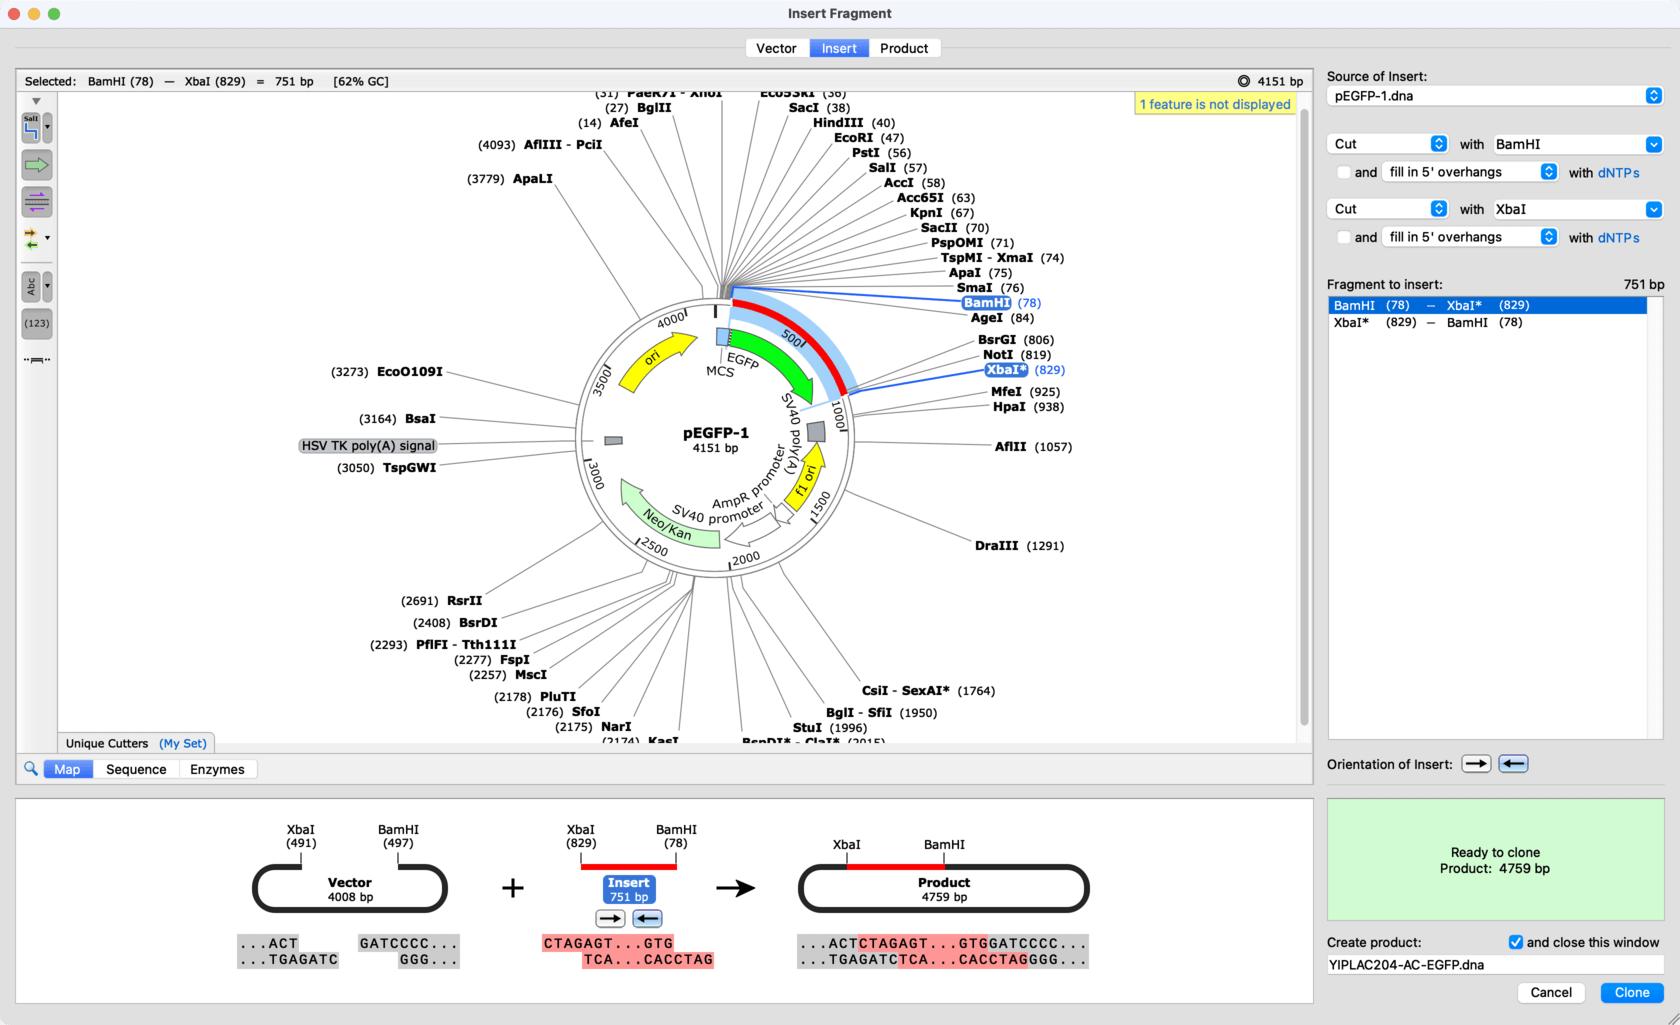 Circular Plasmid Map